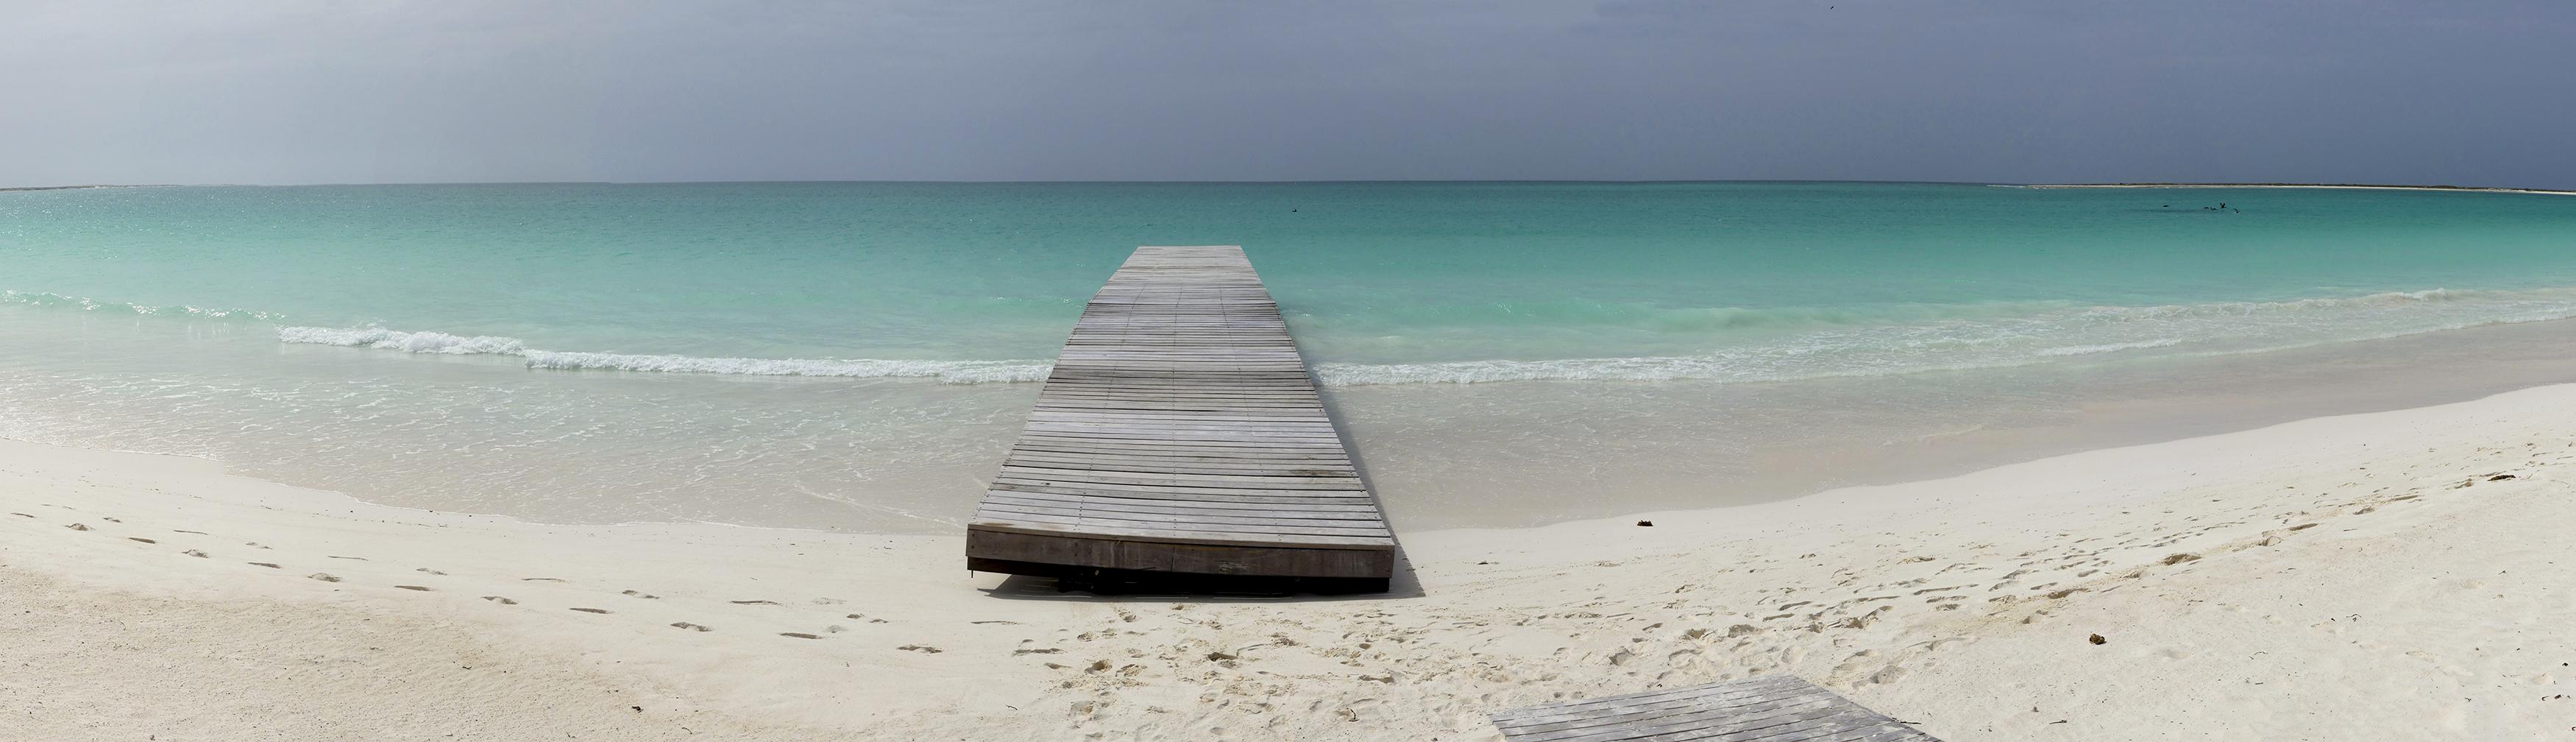 Muelle Playa Caldera